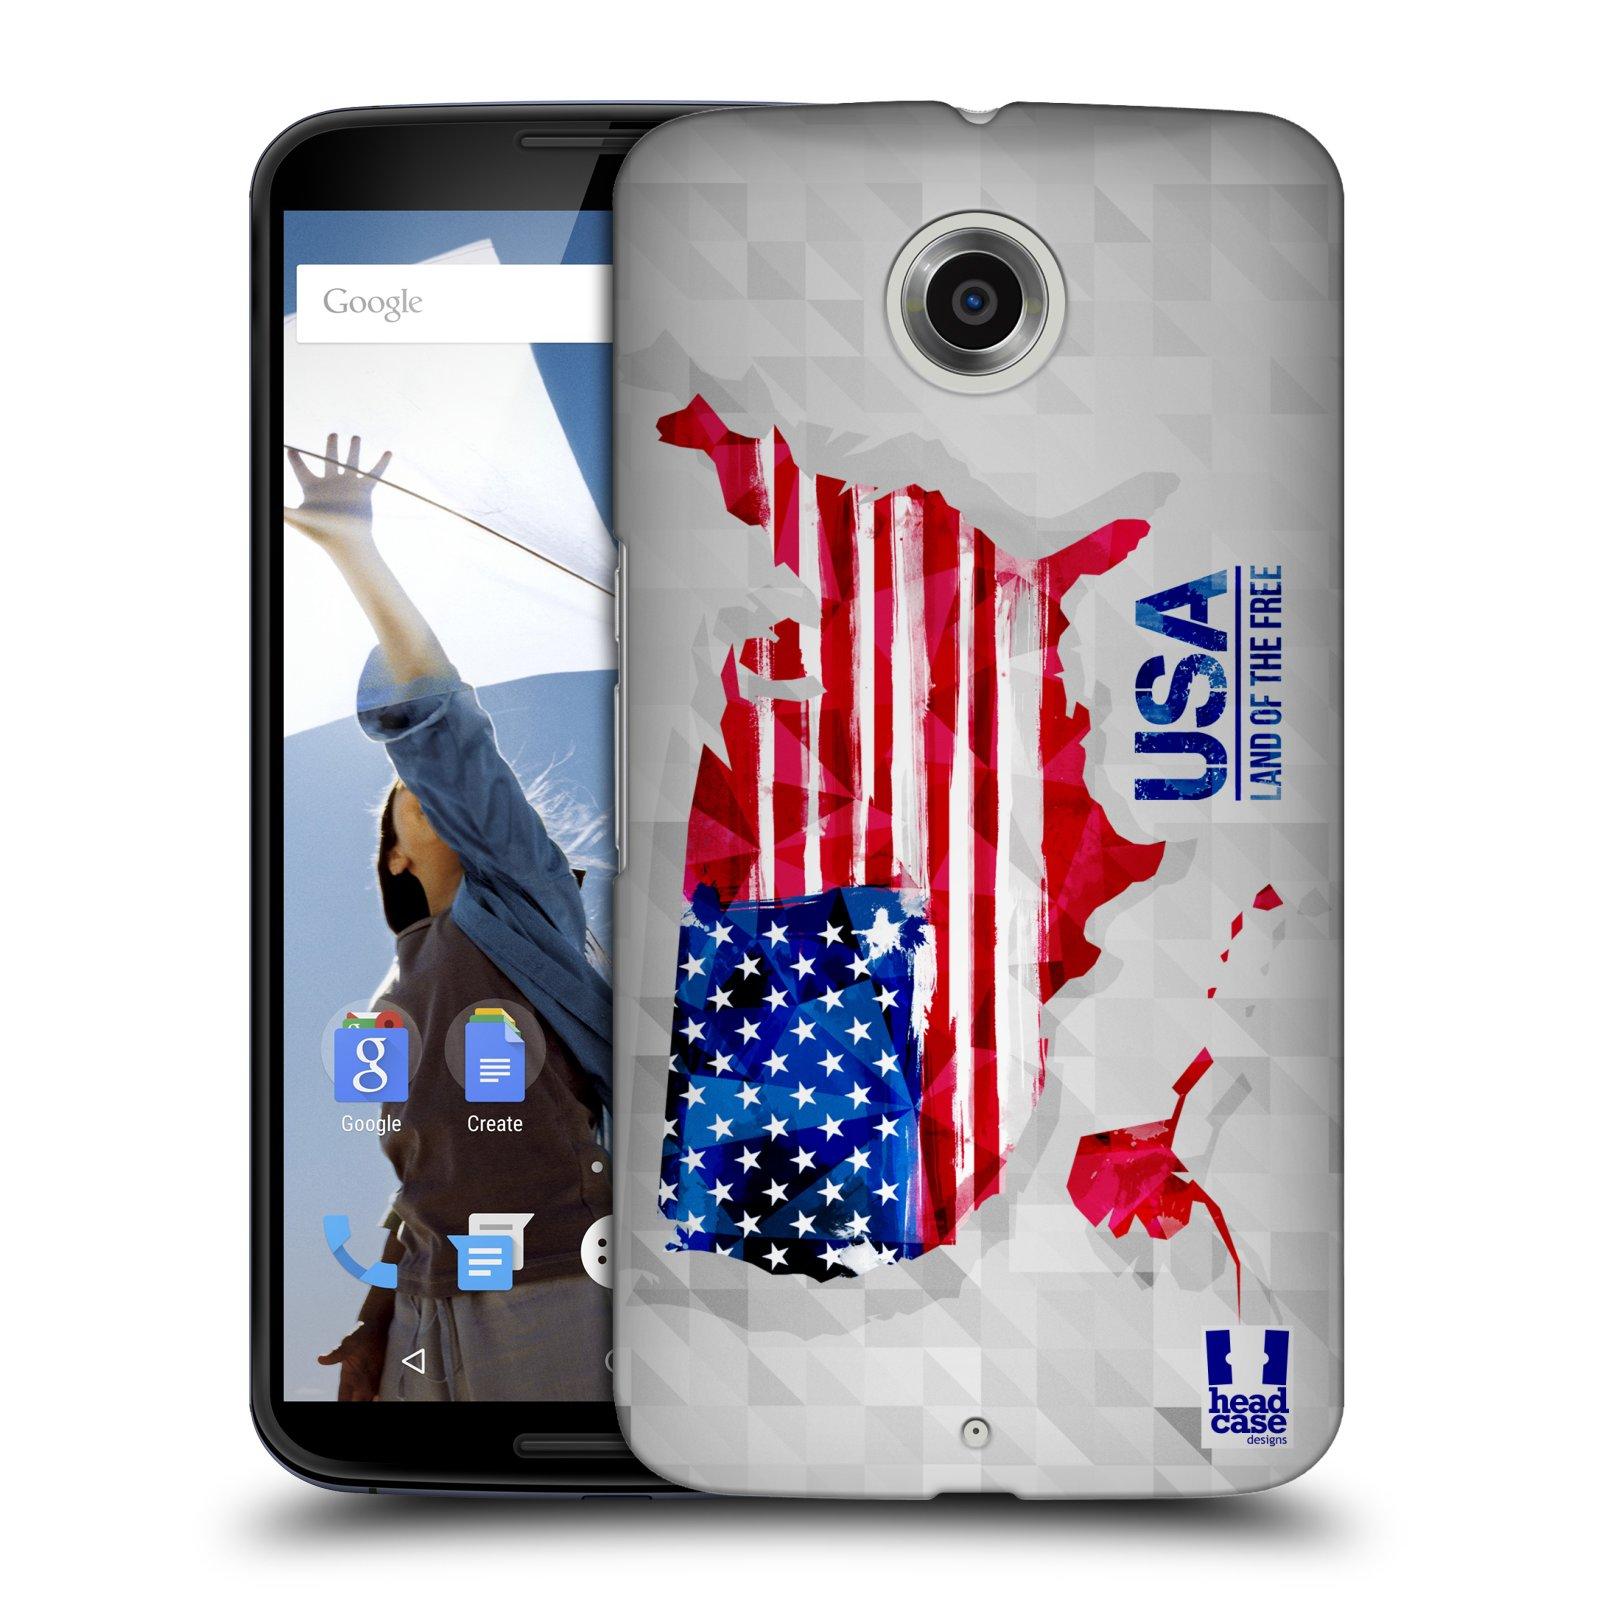 Plastové pouzdro na mobil Motorola Nexus 6 HEAD CASE GEOMAPA USA (Kryt či obal na mobilní telefon Motorola Nexus 6)